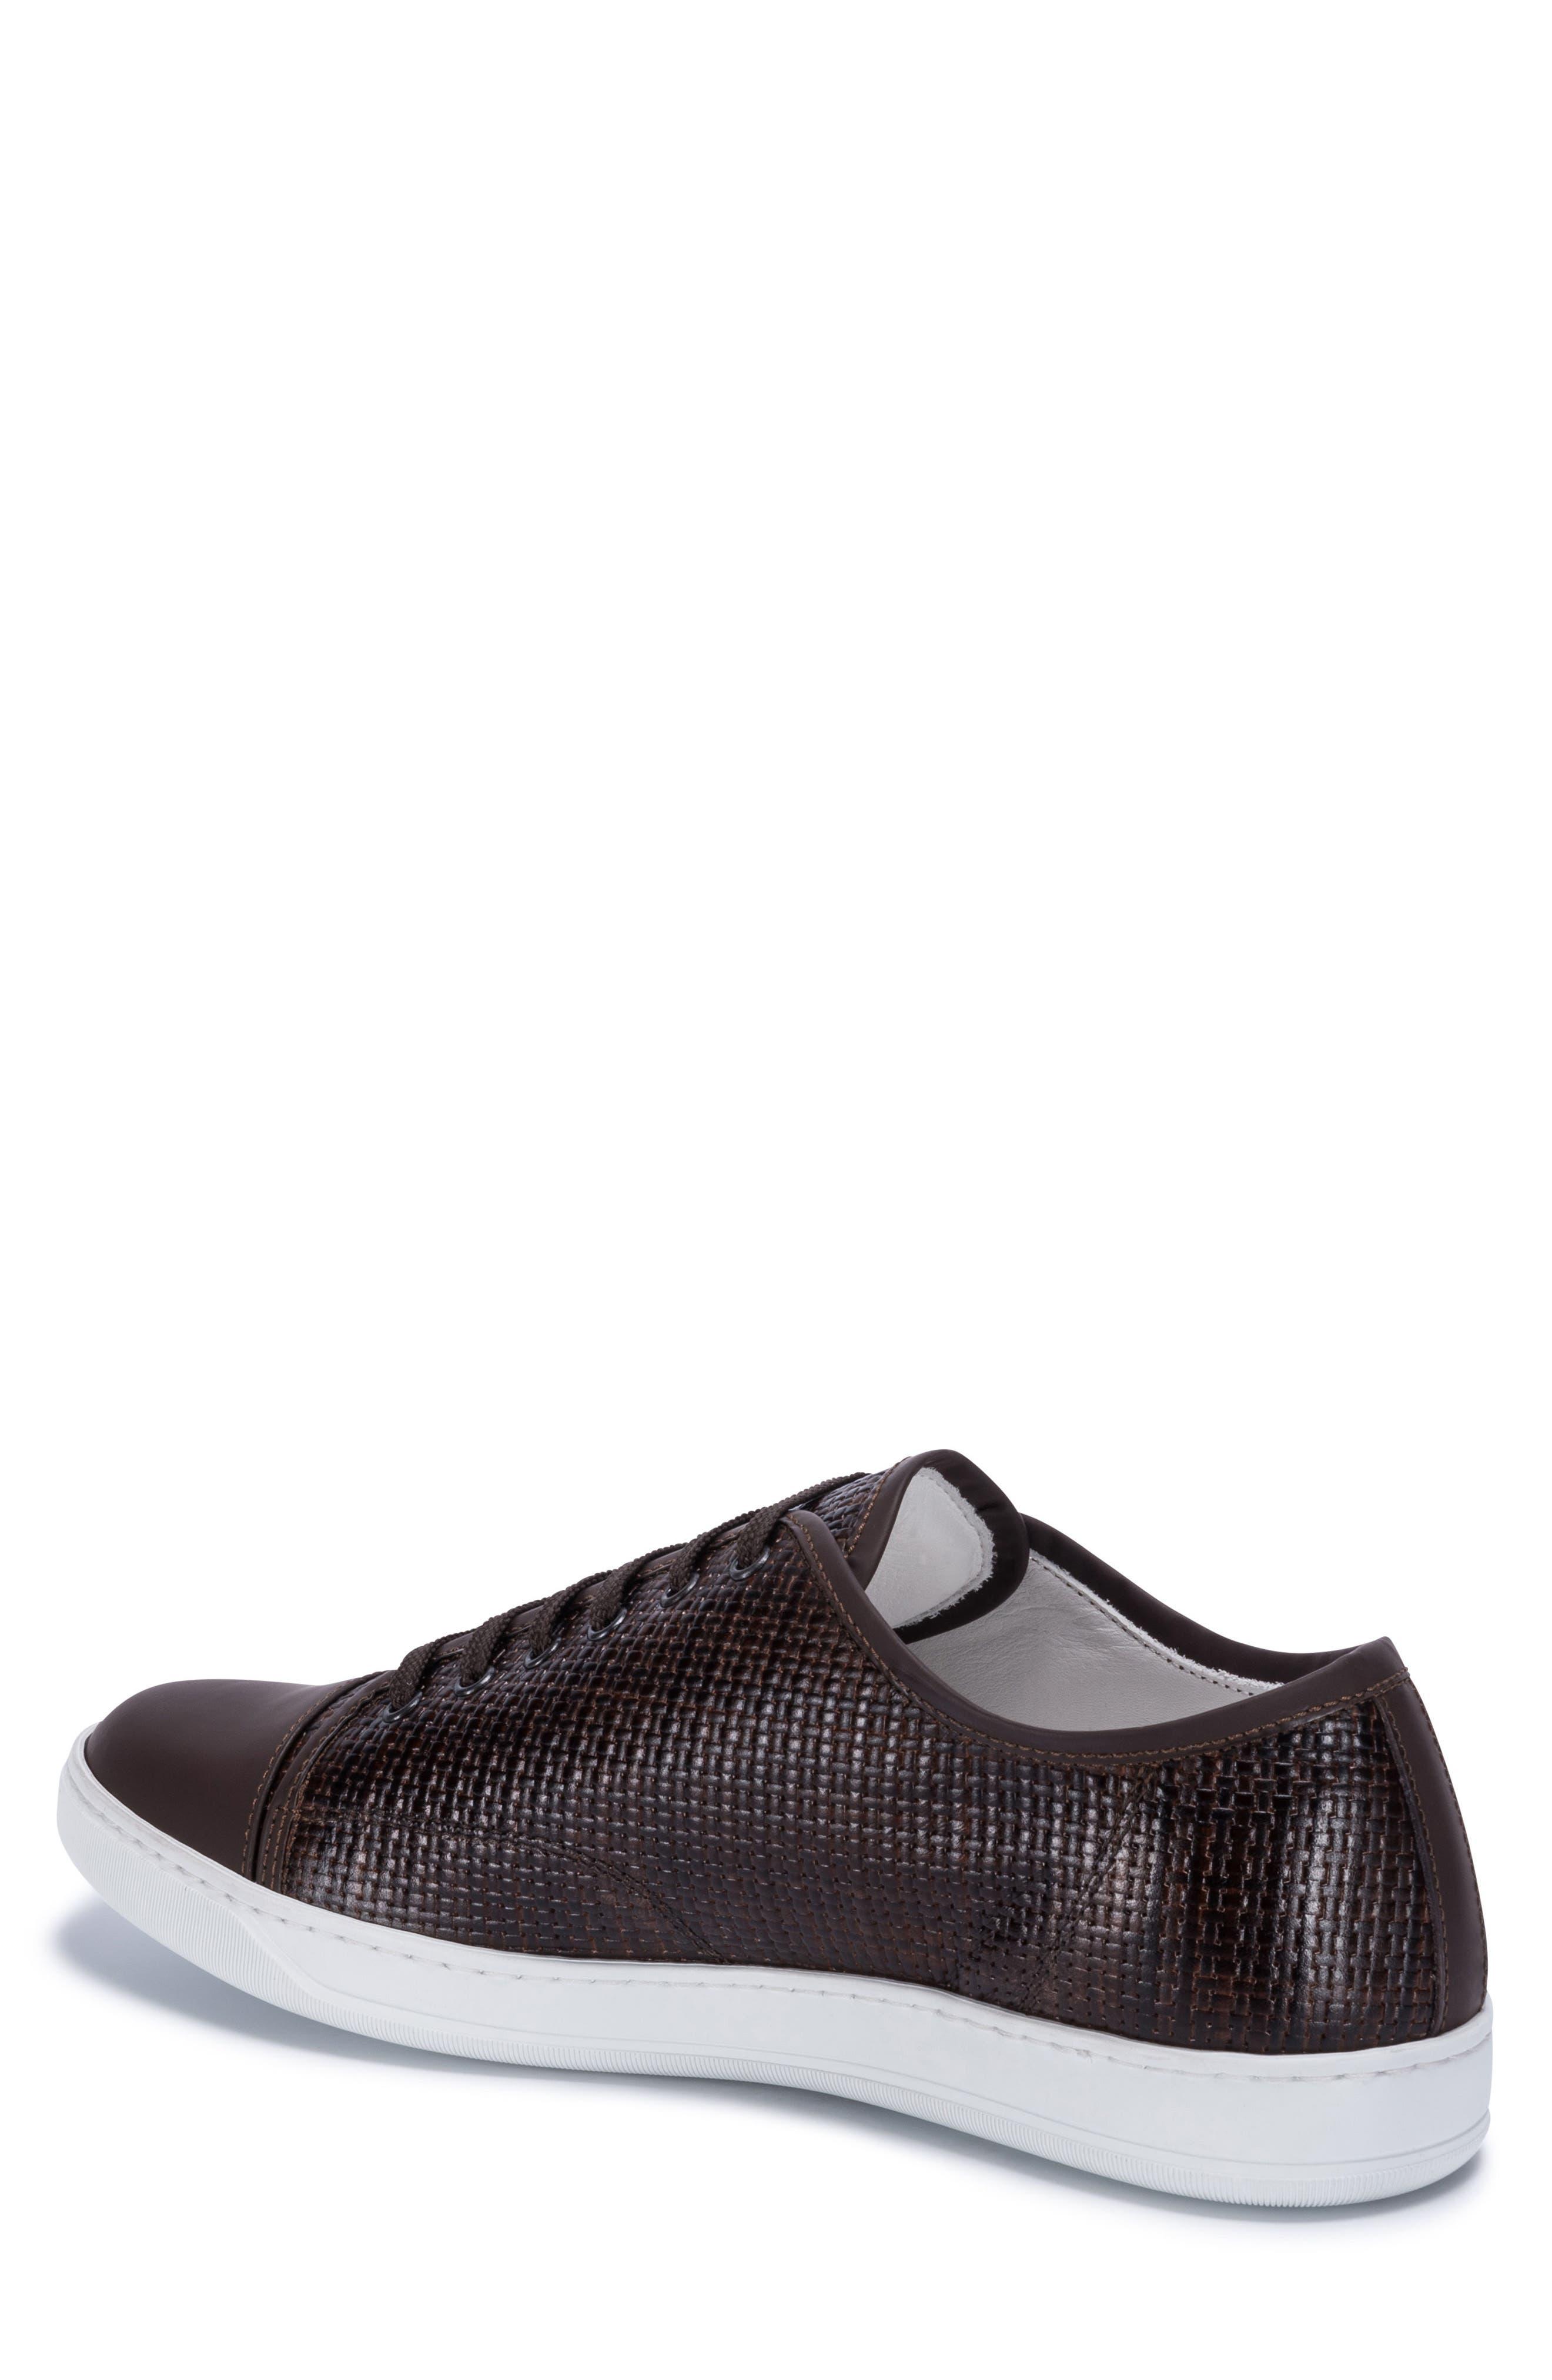 Cinque Terre Woven Cap Toe Sneaker,                             Alternate thumbnail 2, color,                             Brown Leather